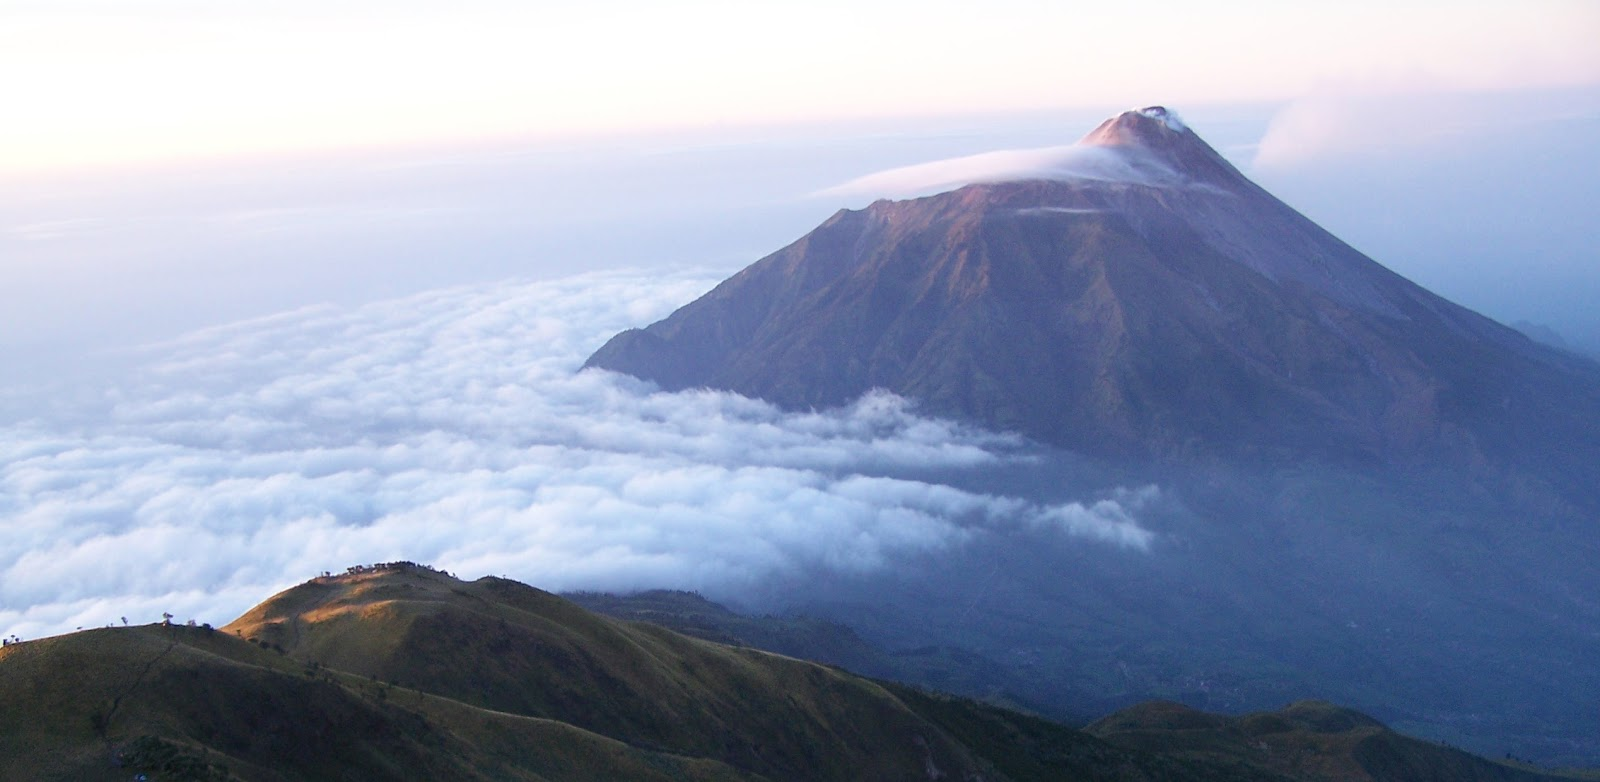 31+ Peta Pendakian Gunung Lawu Via Cemoro Kandang Images